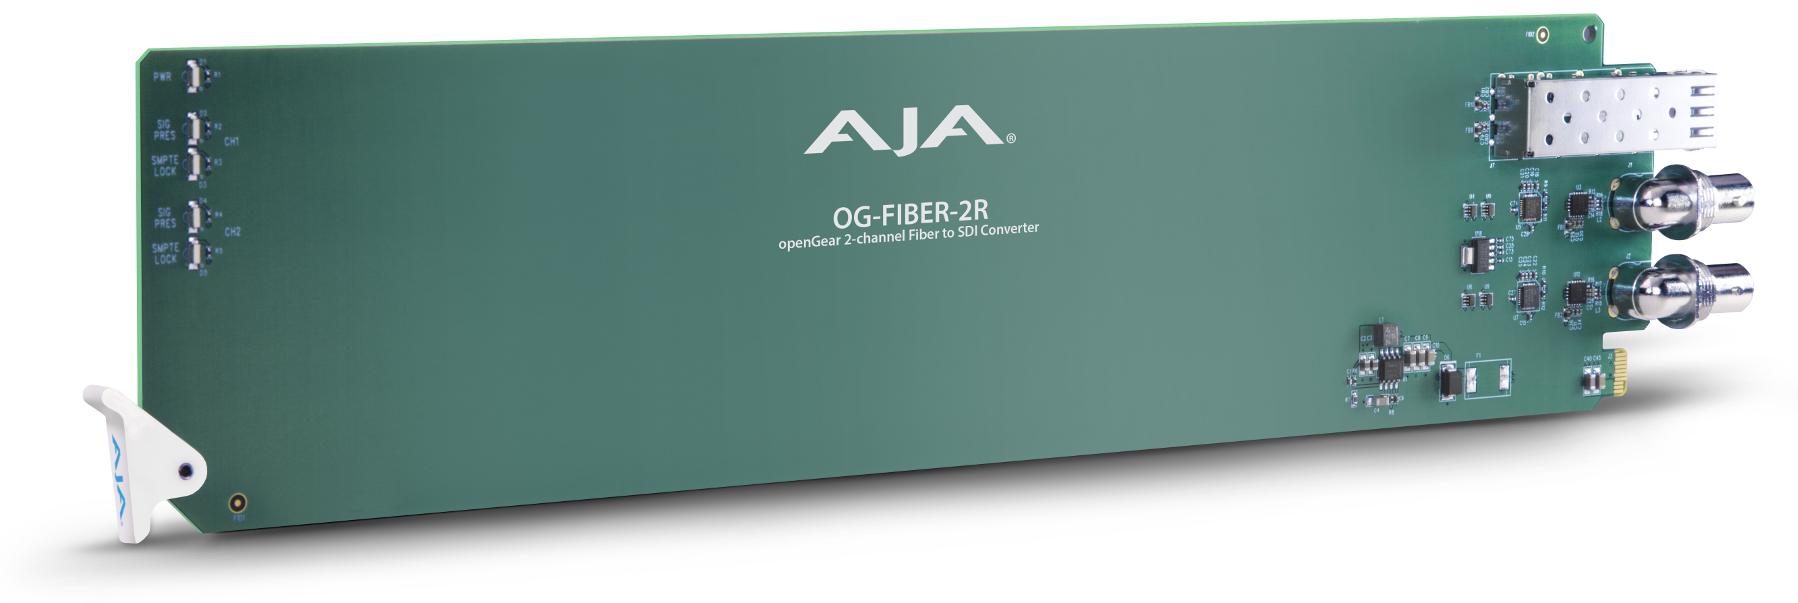 2-Channel openGear Fiber to 3G-SDI Converter